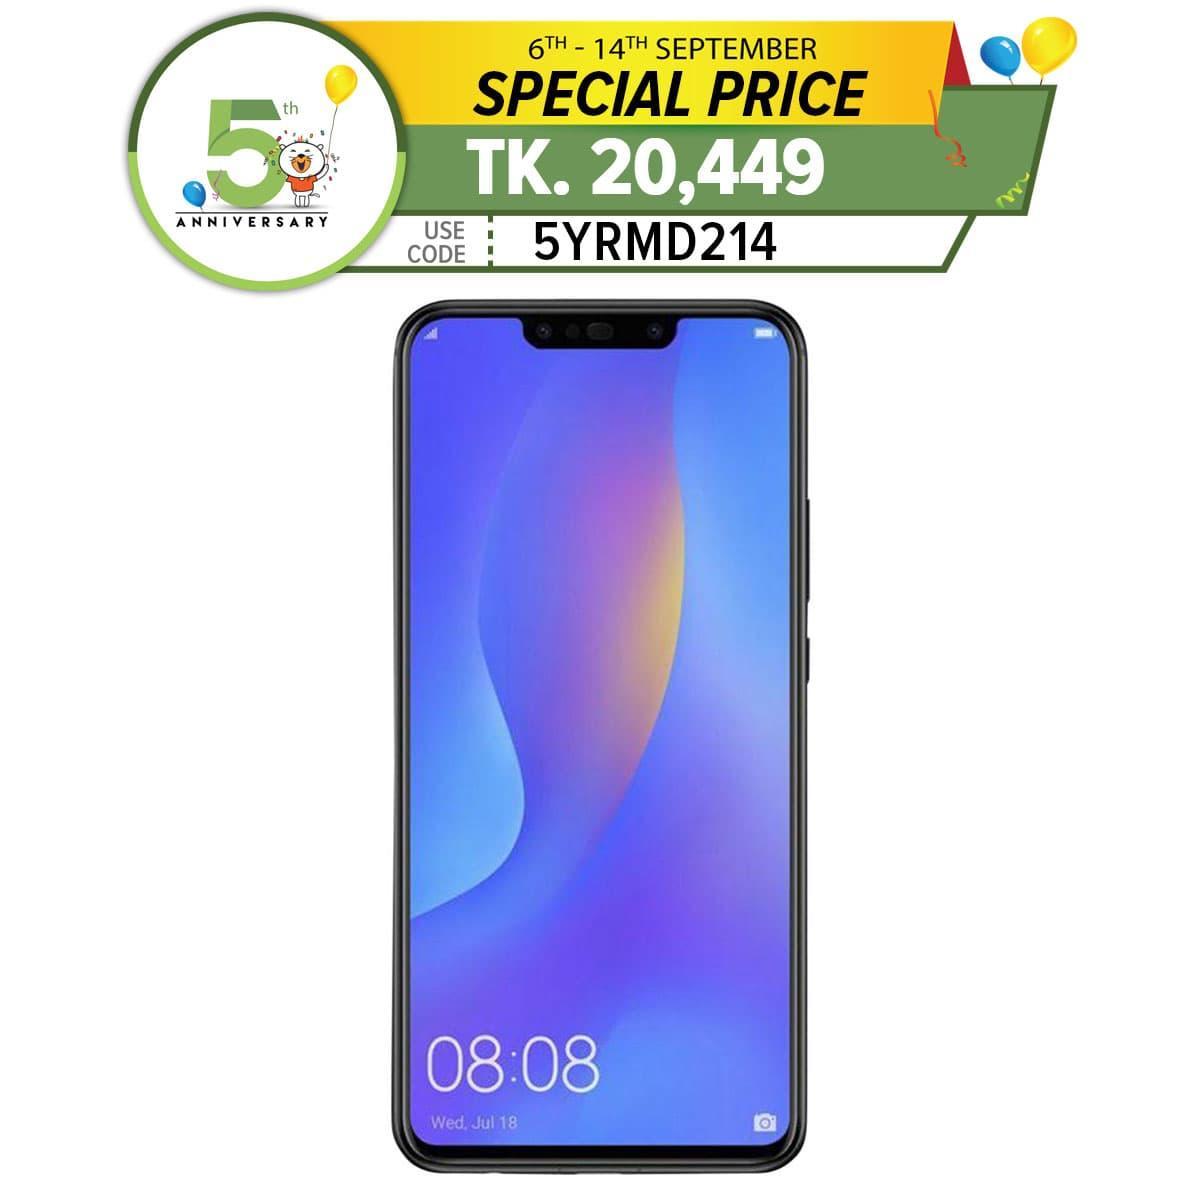 Huawei Nova 3i Smartphone 6 3- 4 GB + 128 GBFour AI Camera16MP+2MP & 24MP +  2MP - Black